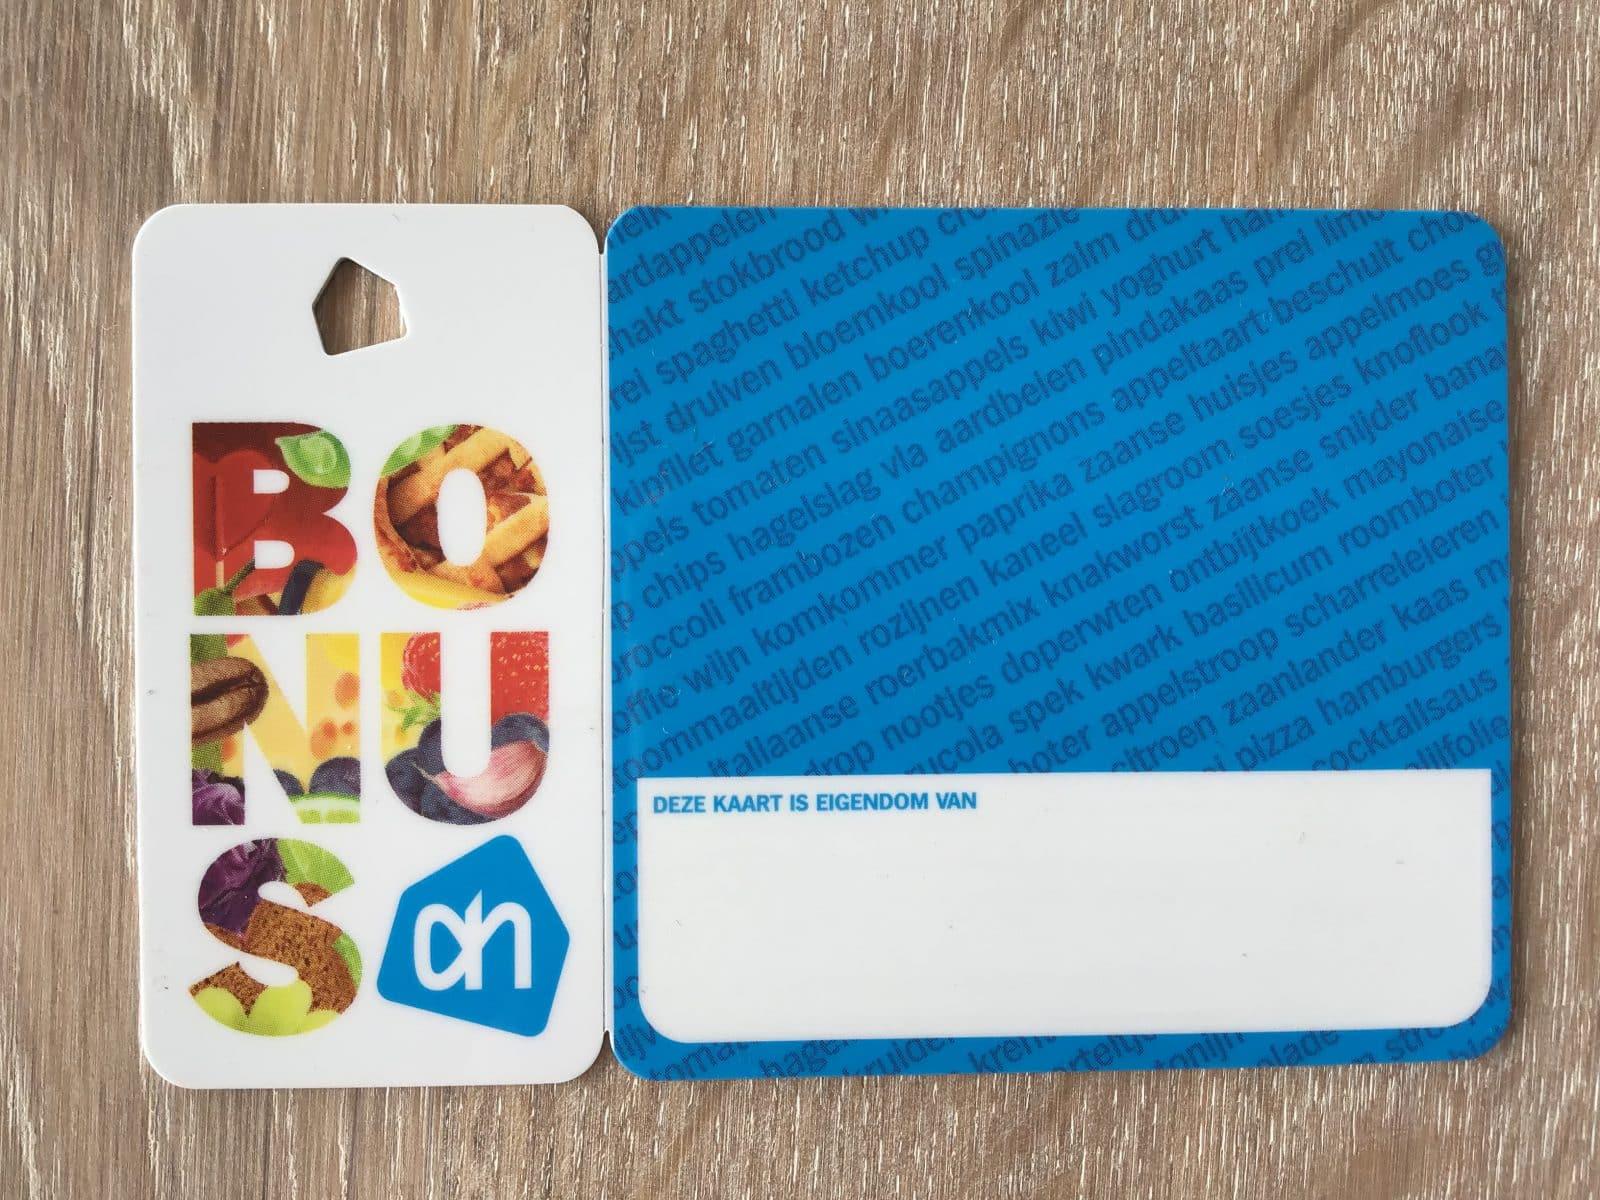 glutenvrije agenda, AH bonus kortingskaart